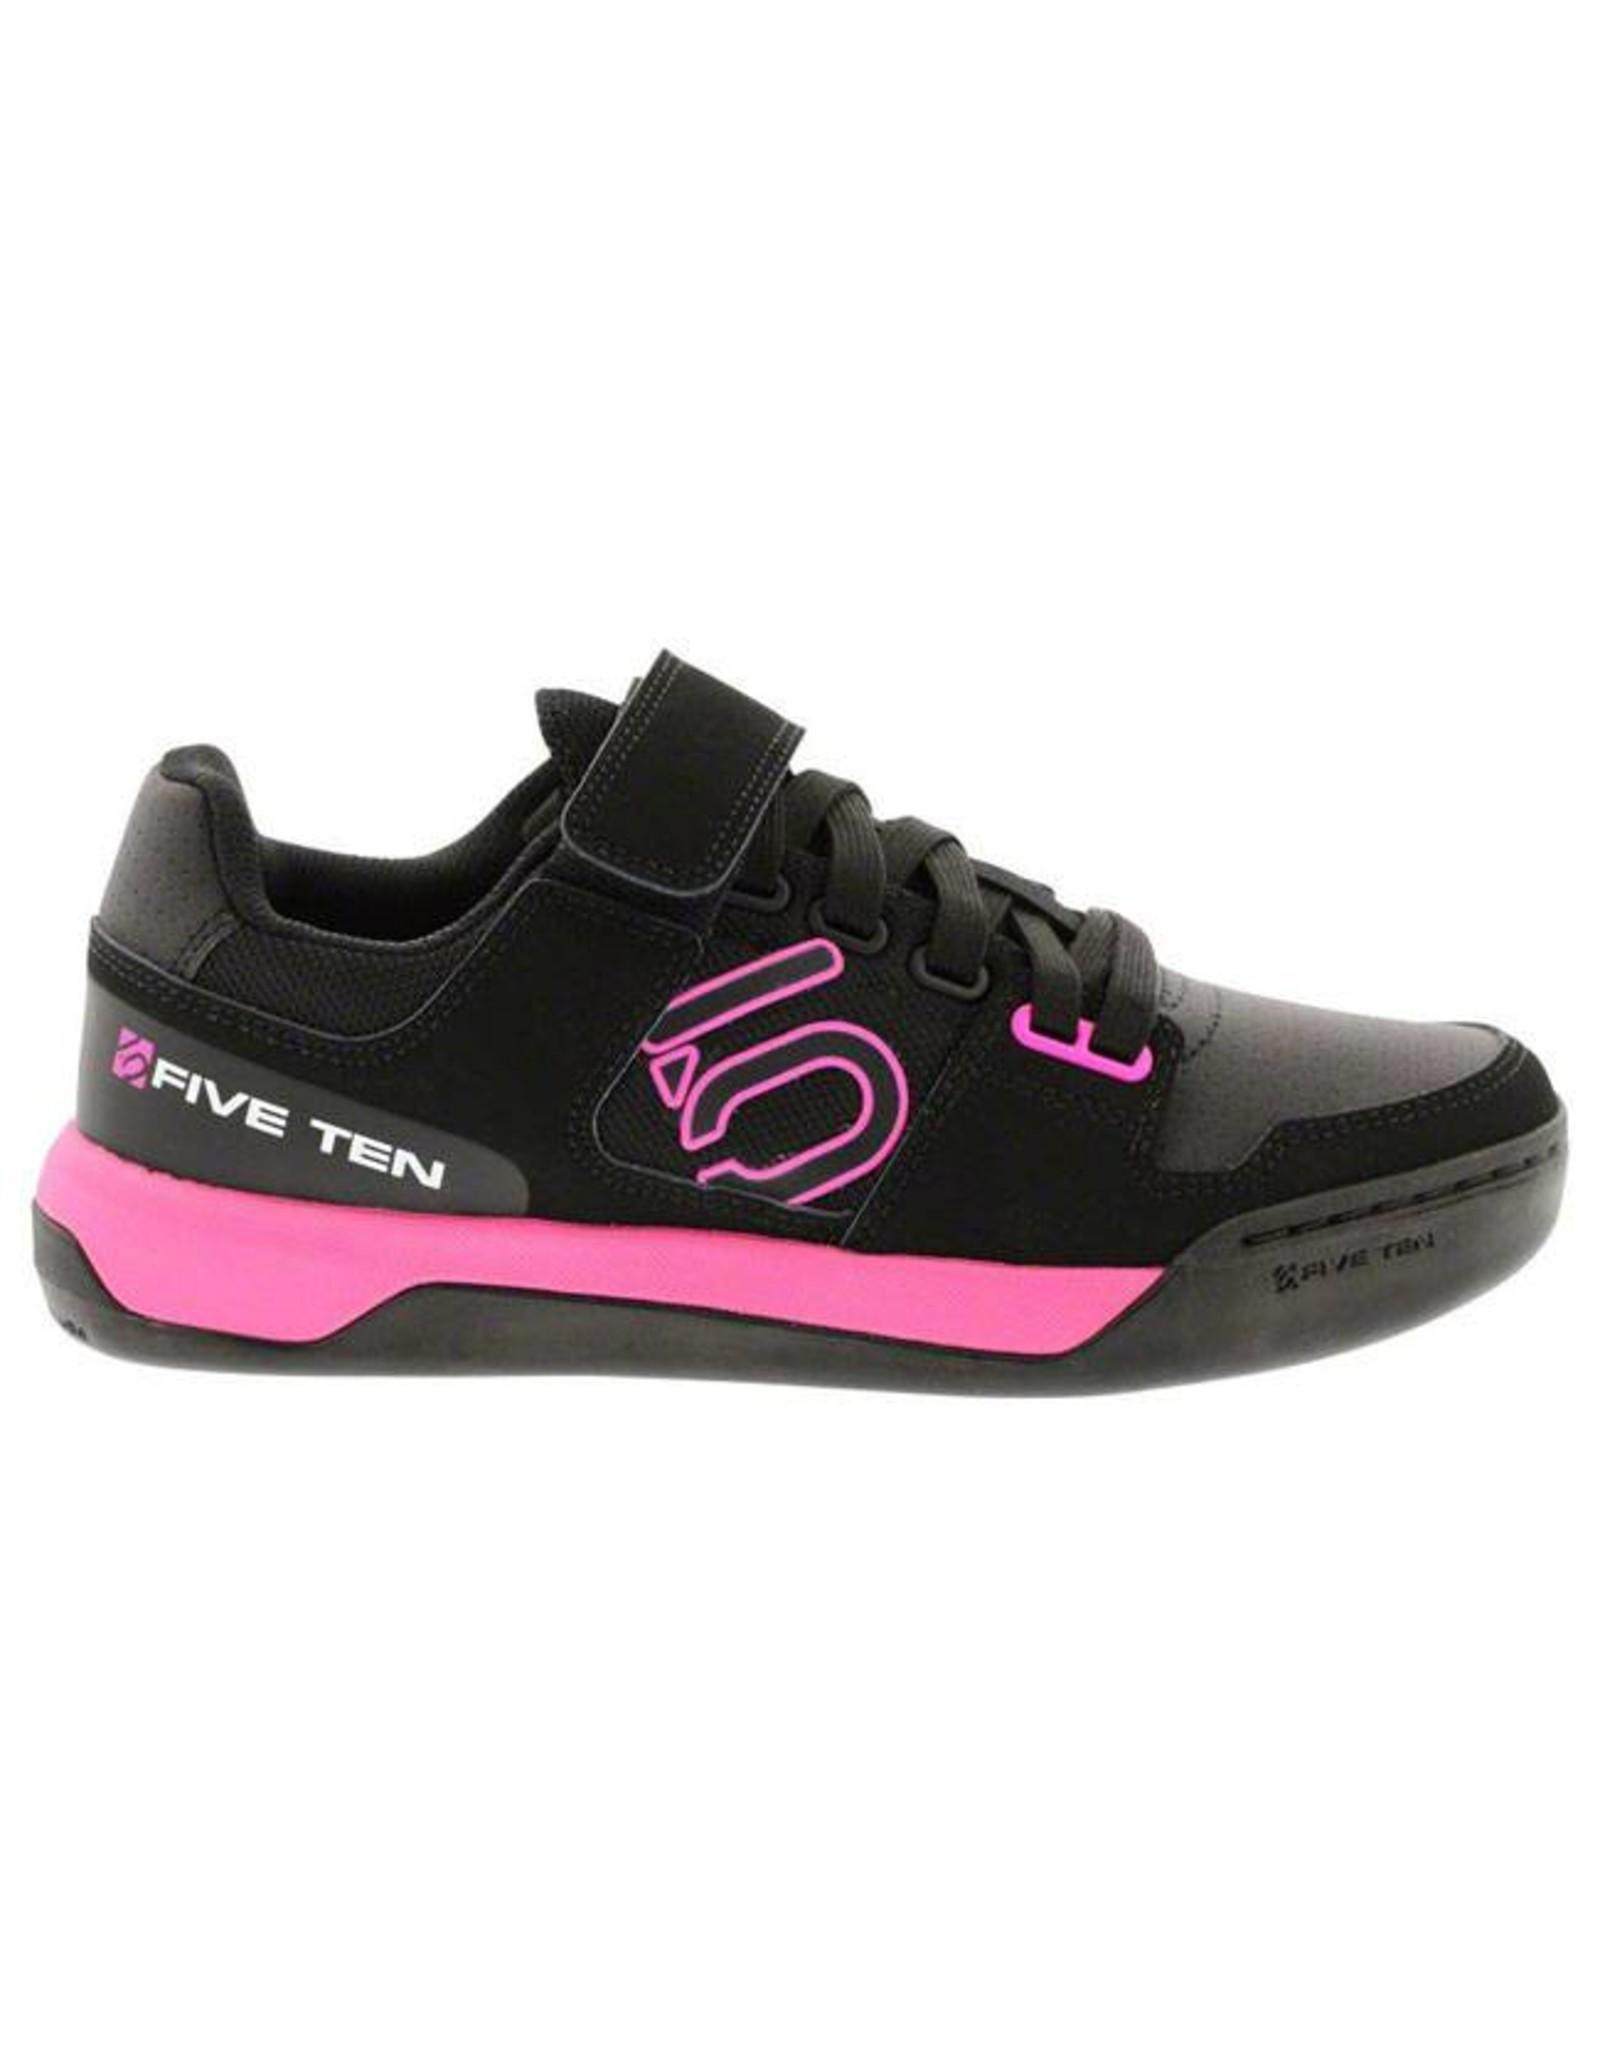 Five Ten Five Ten Hellcat Women's Clipless/Flat Pedal Shoe: Shock Pink 11